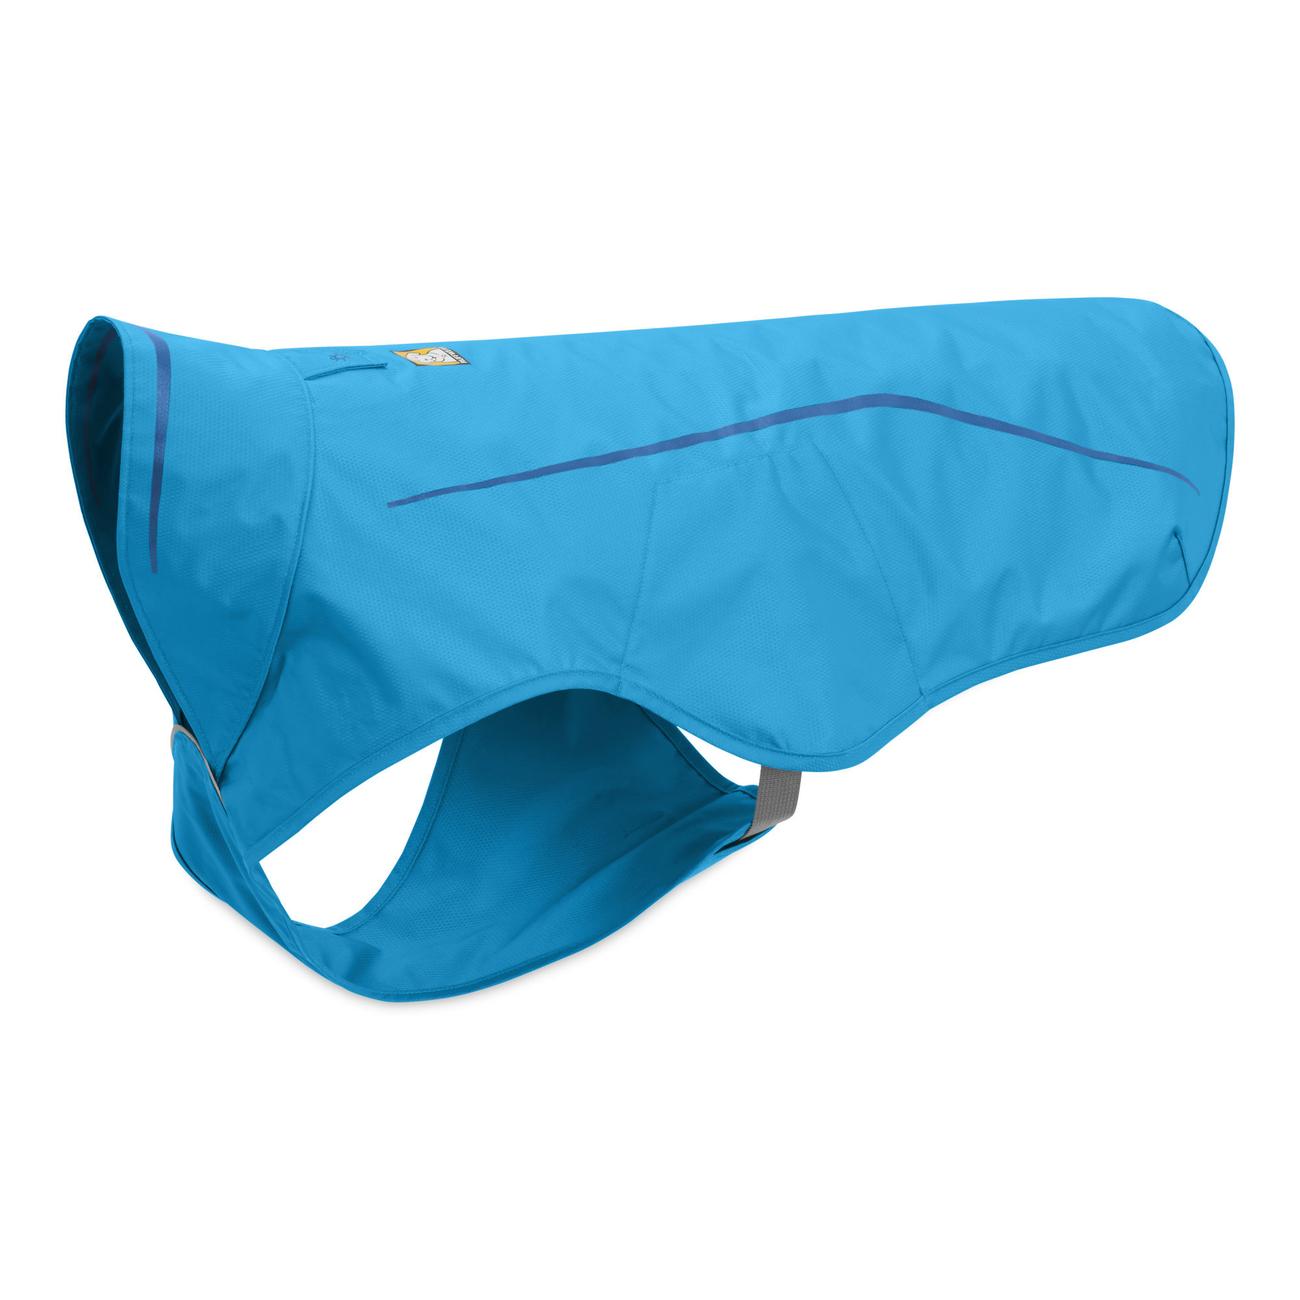 Ruffwear Sun Shower Regenjacke für Hunde, Bild 2